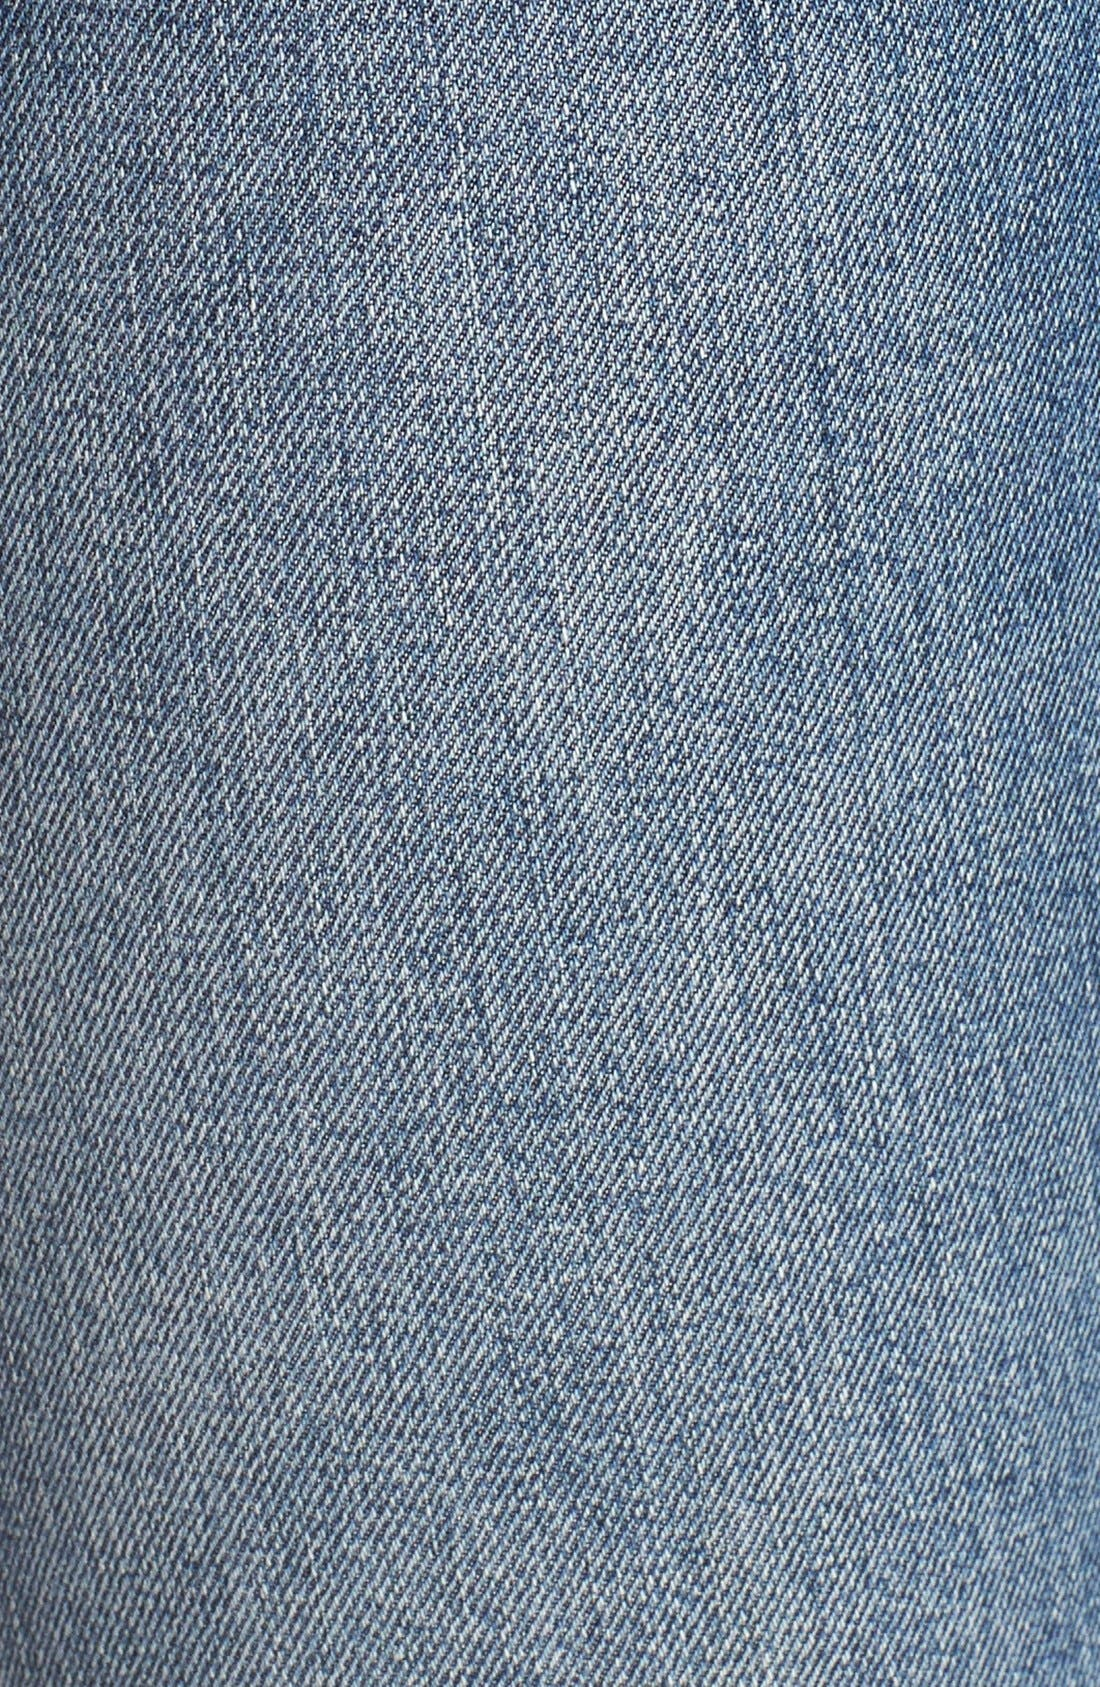 Alternate Image 5  - M.i.h.Jeans 'Marrakesh' Flare Jeans